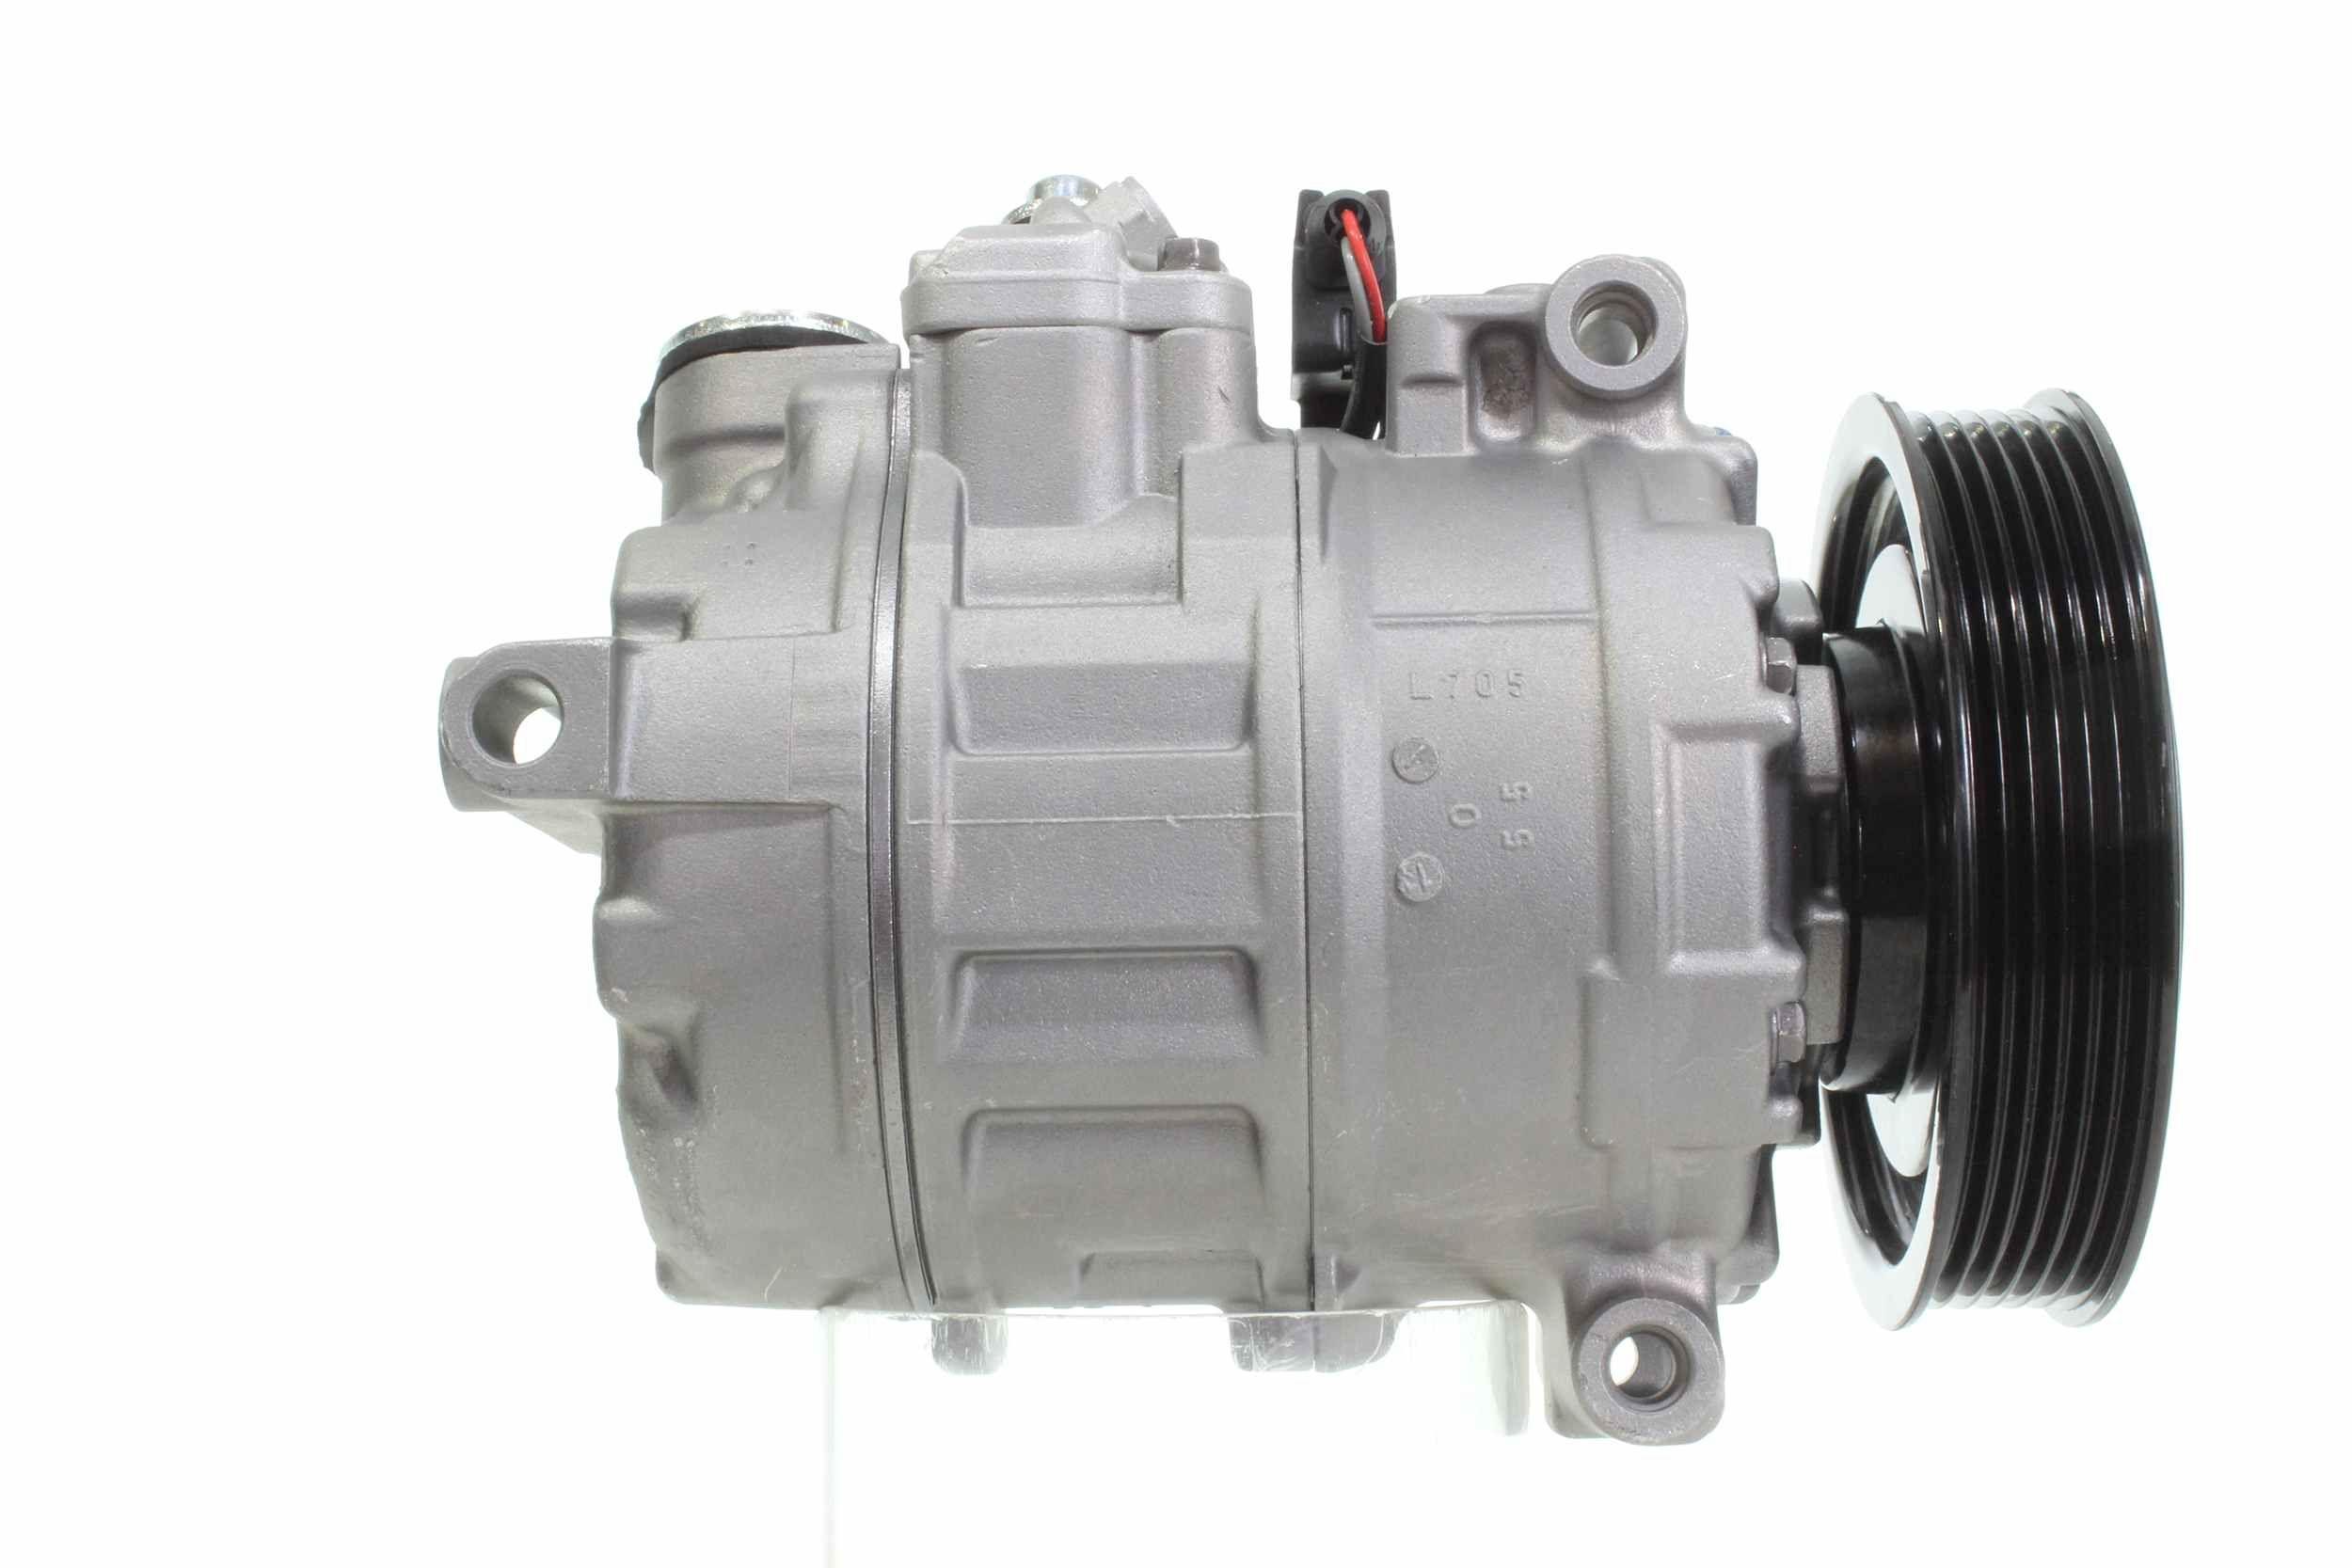 10550945 Kompressor, Klimaanlage ALANKO 550945 - Große Auswahl - stark reduziert